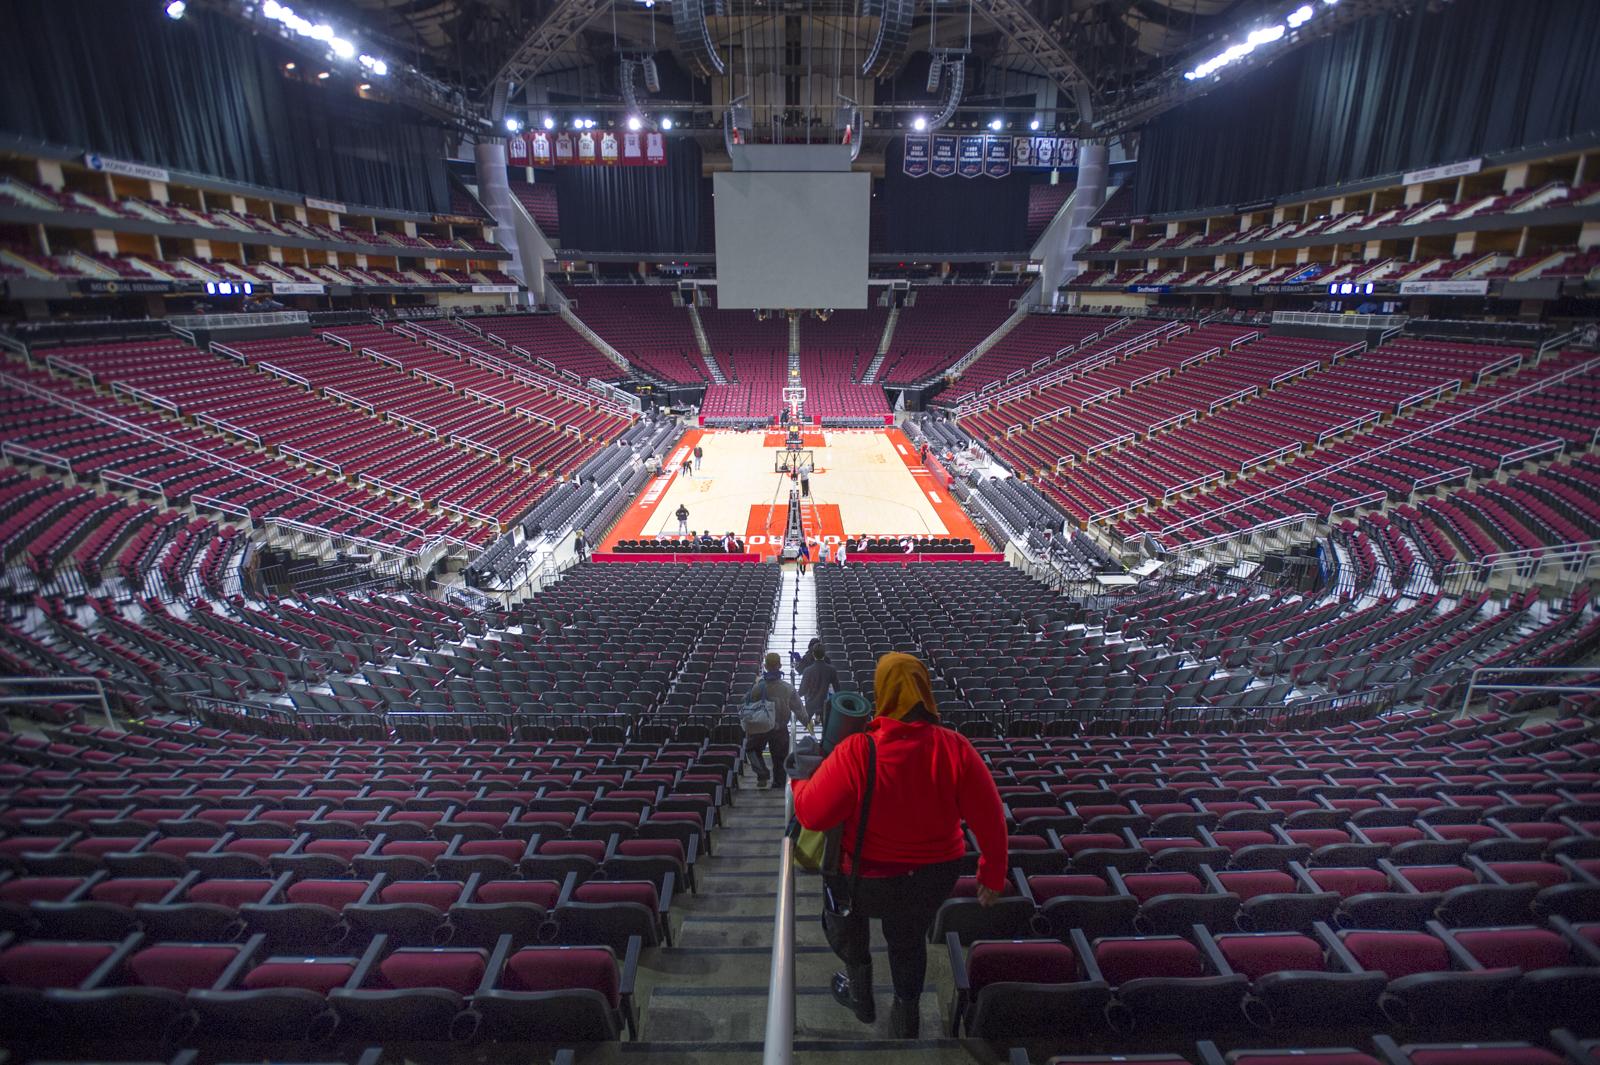 Houston Toyota Center